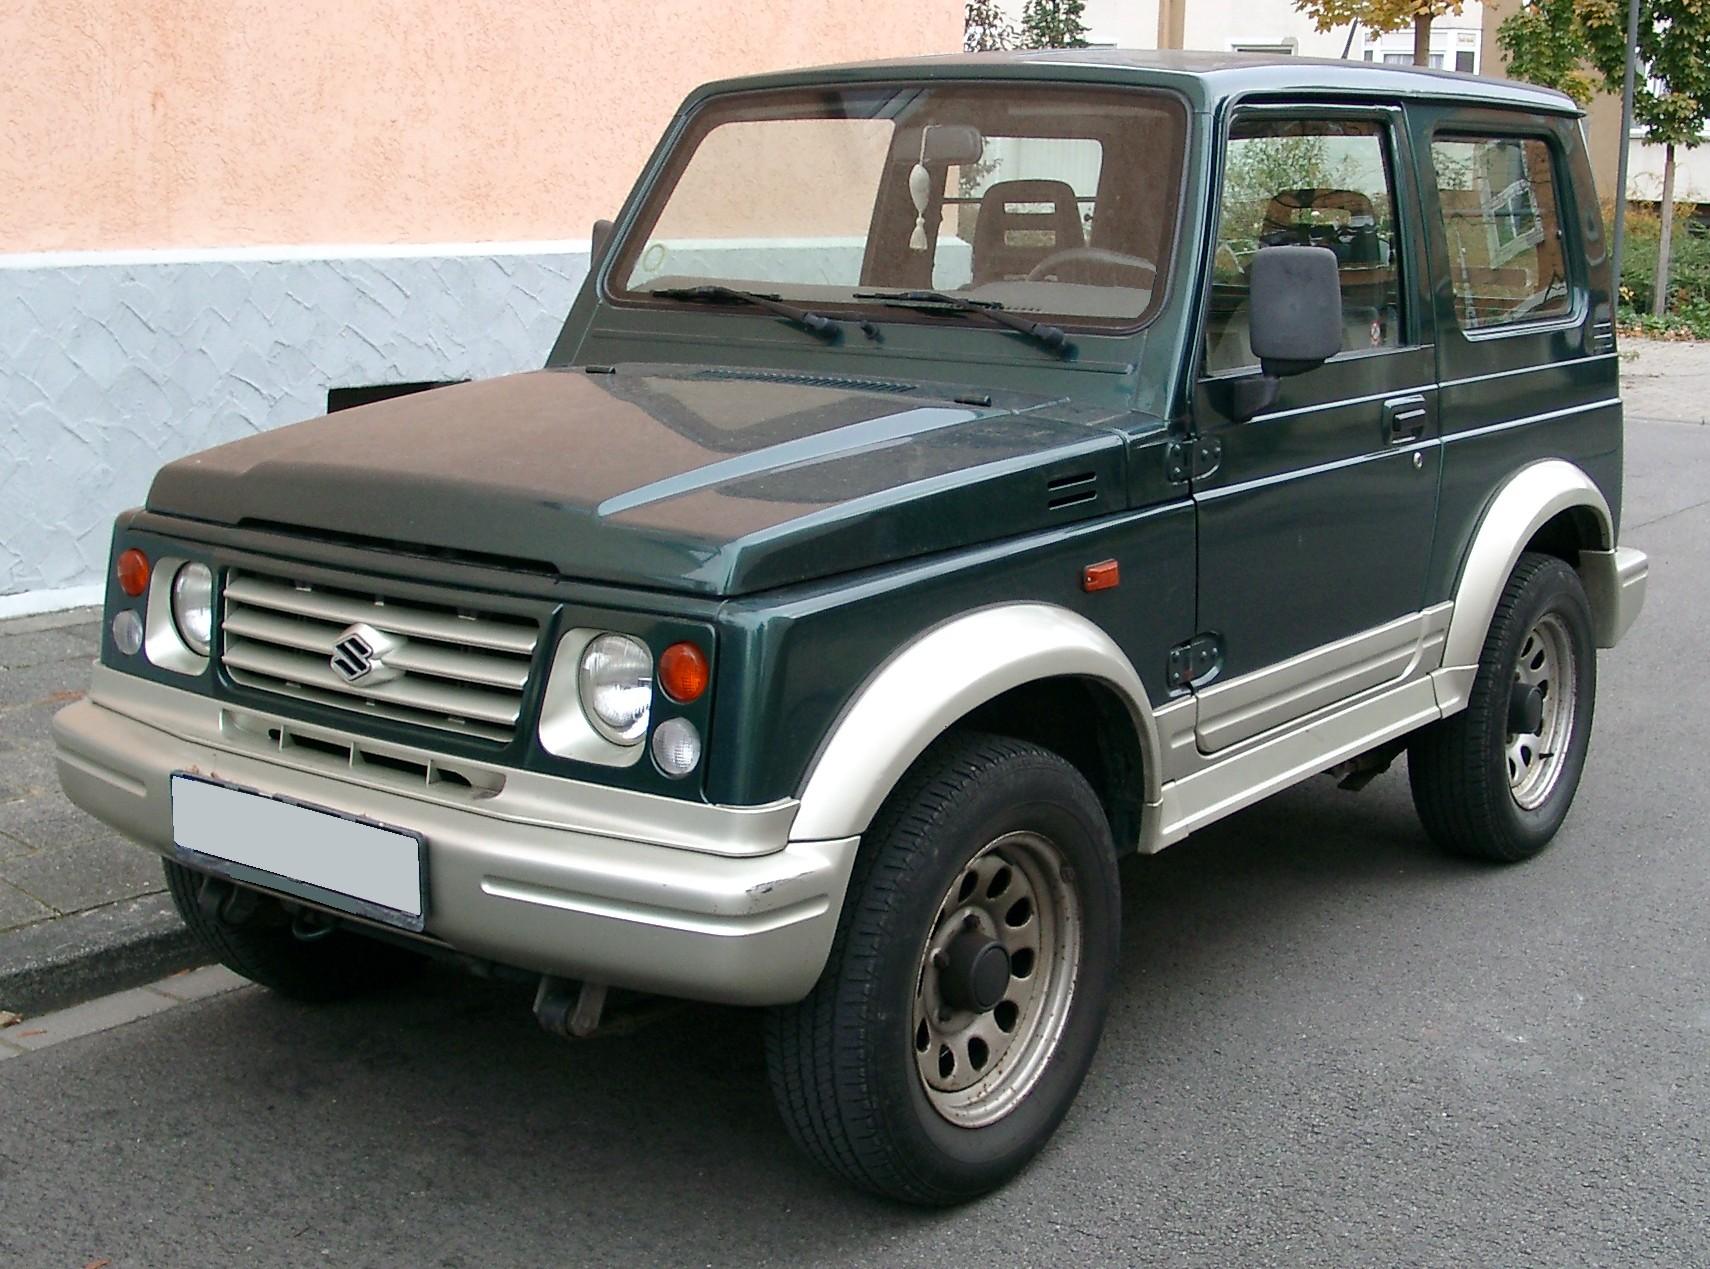 2000 Suzuki Samurai